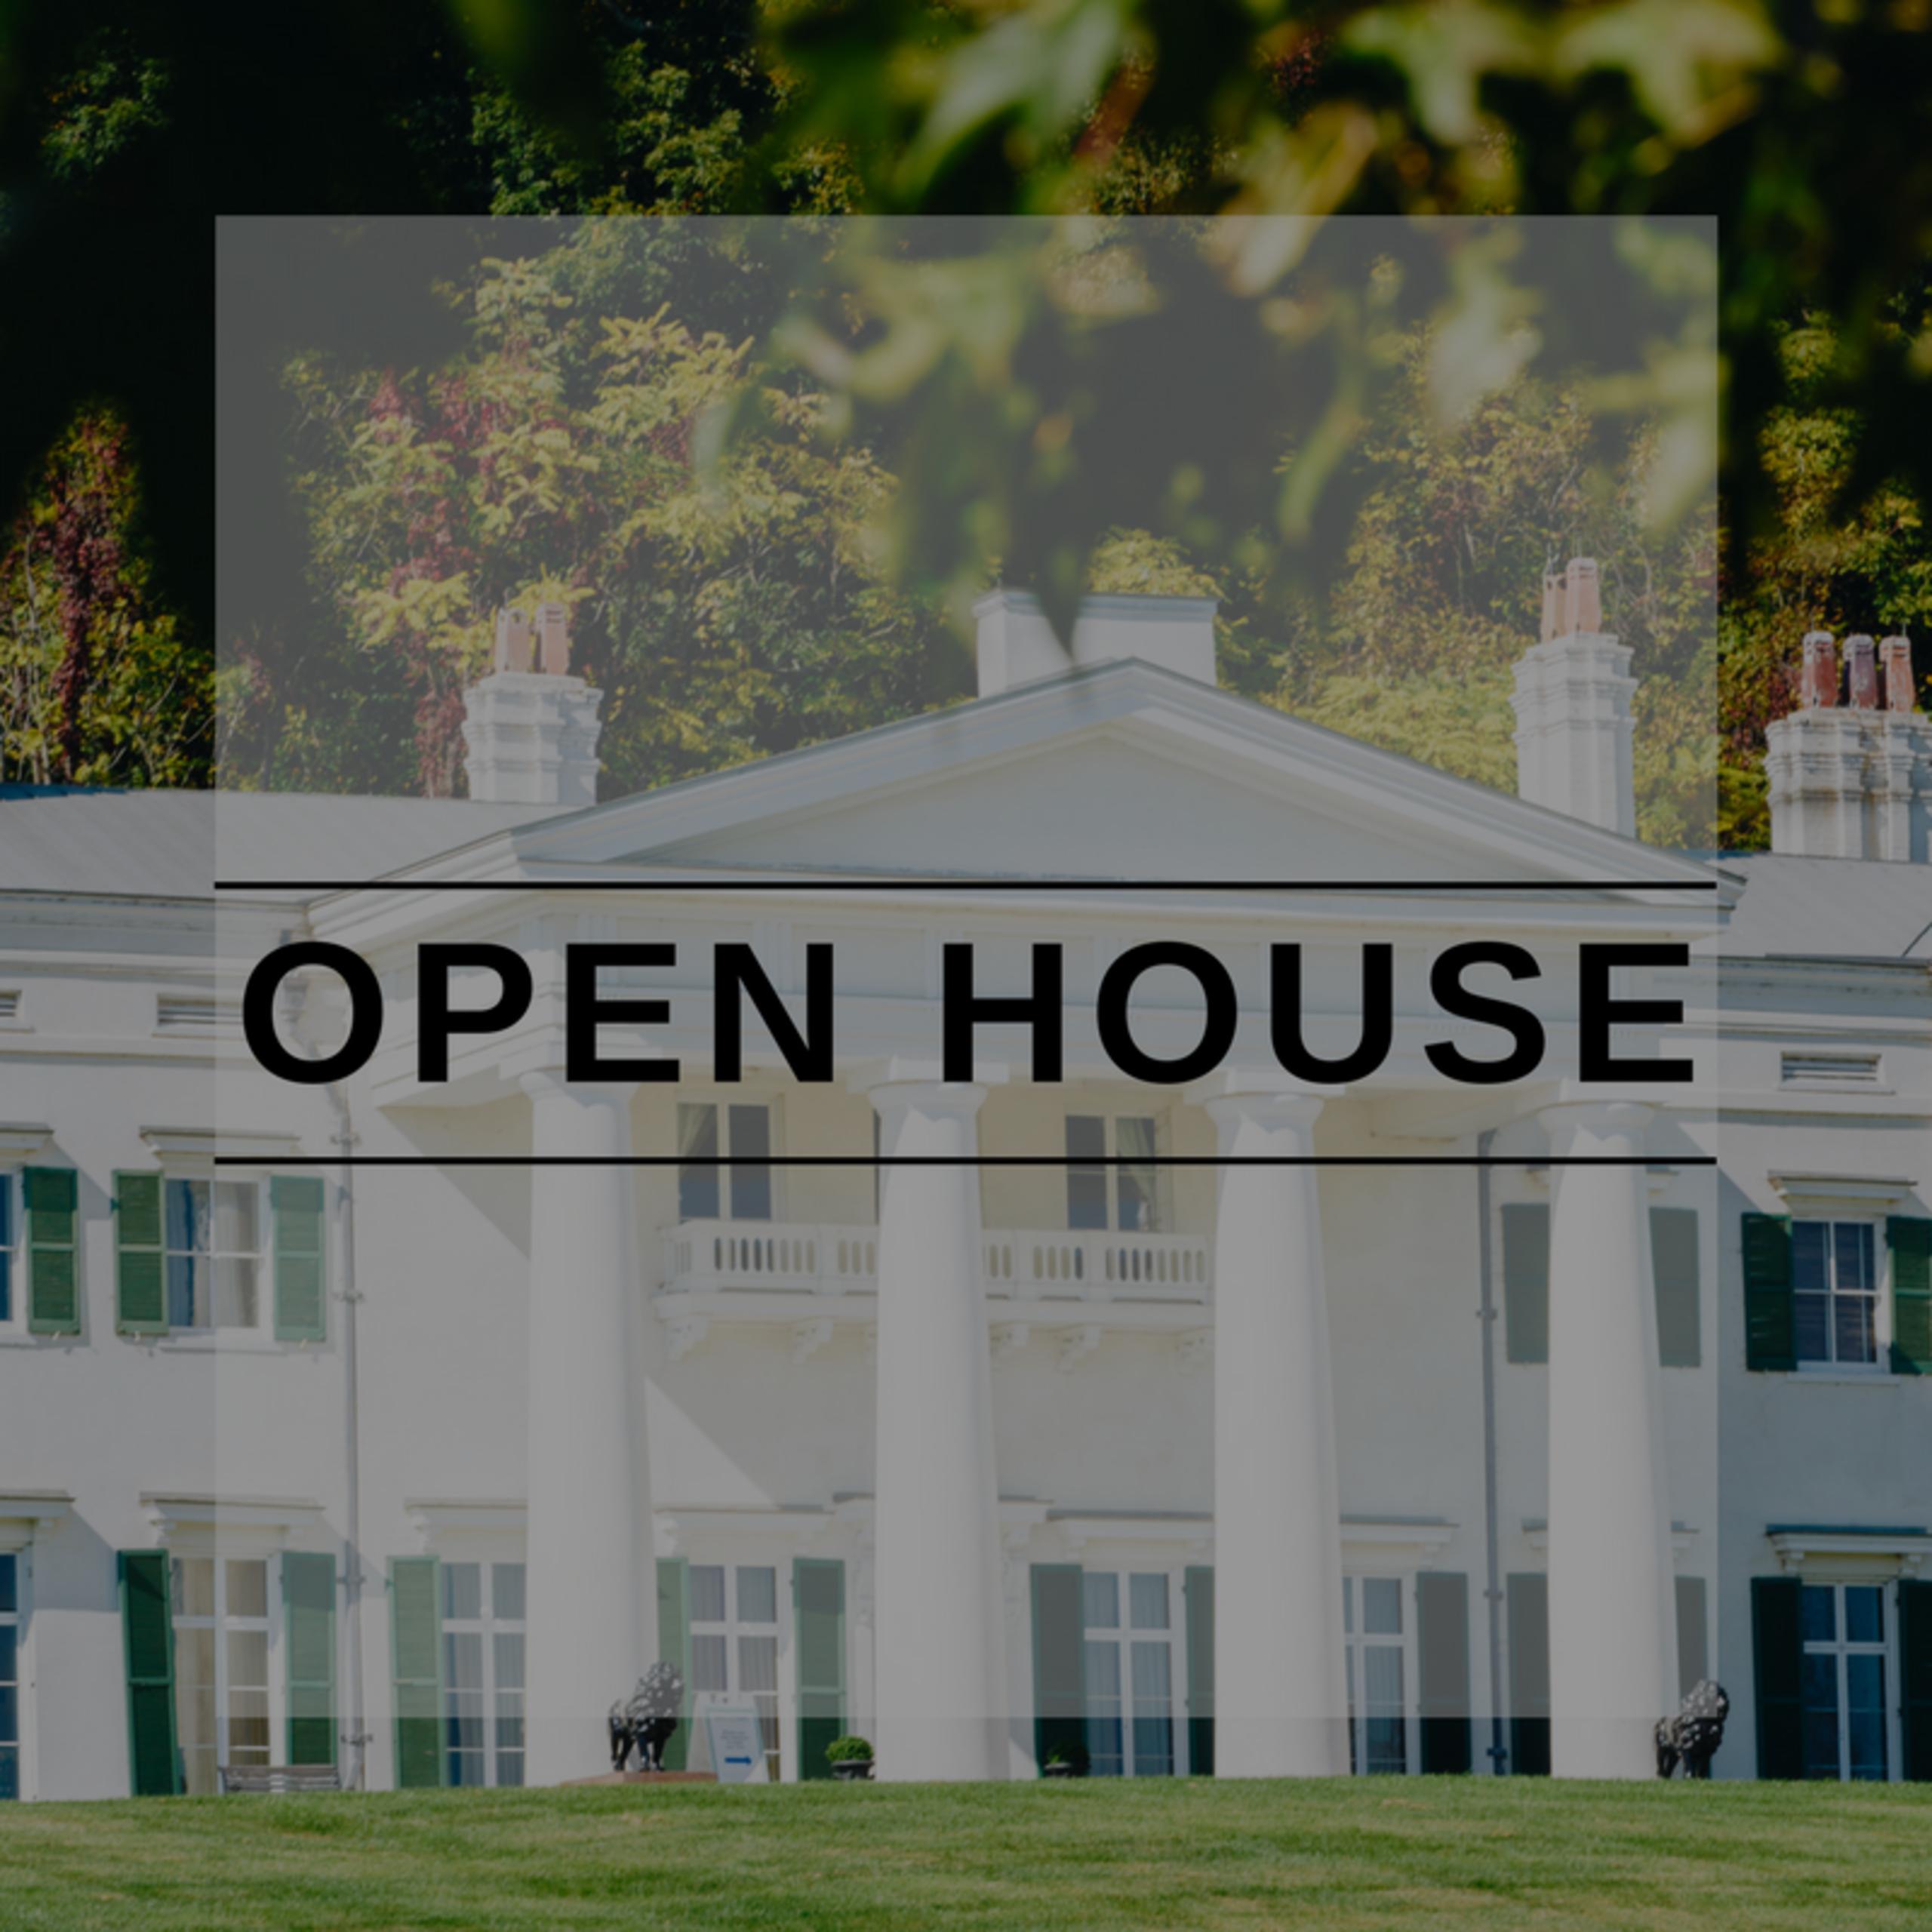 OPEN HOUSE LIST 4/14/18 – 4/15/18